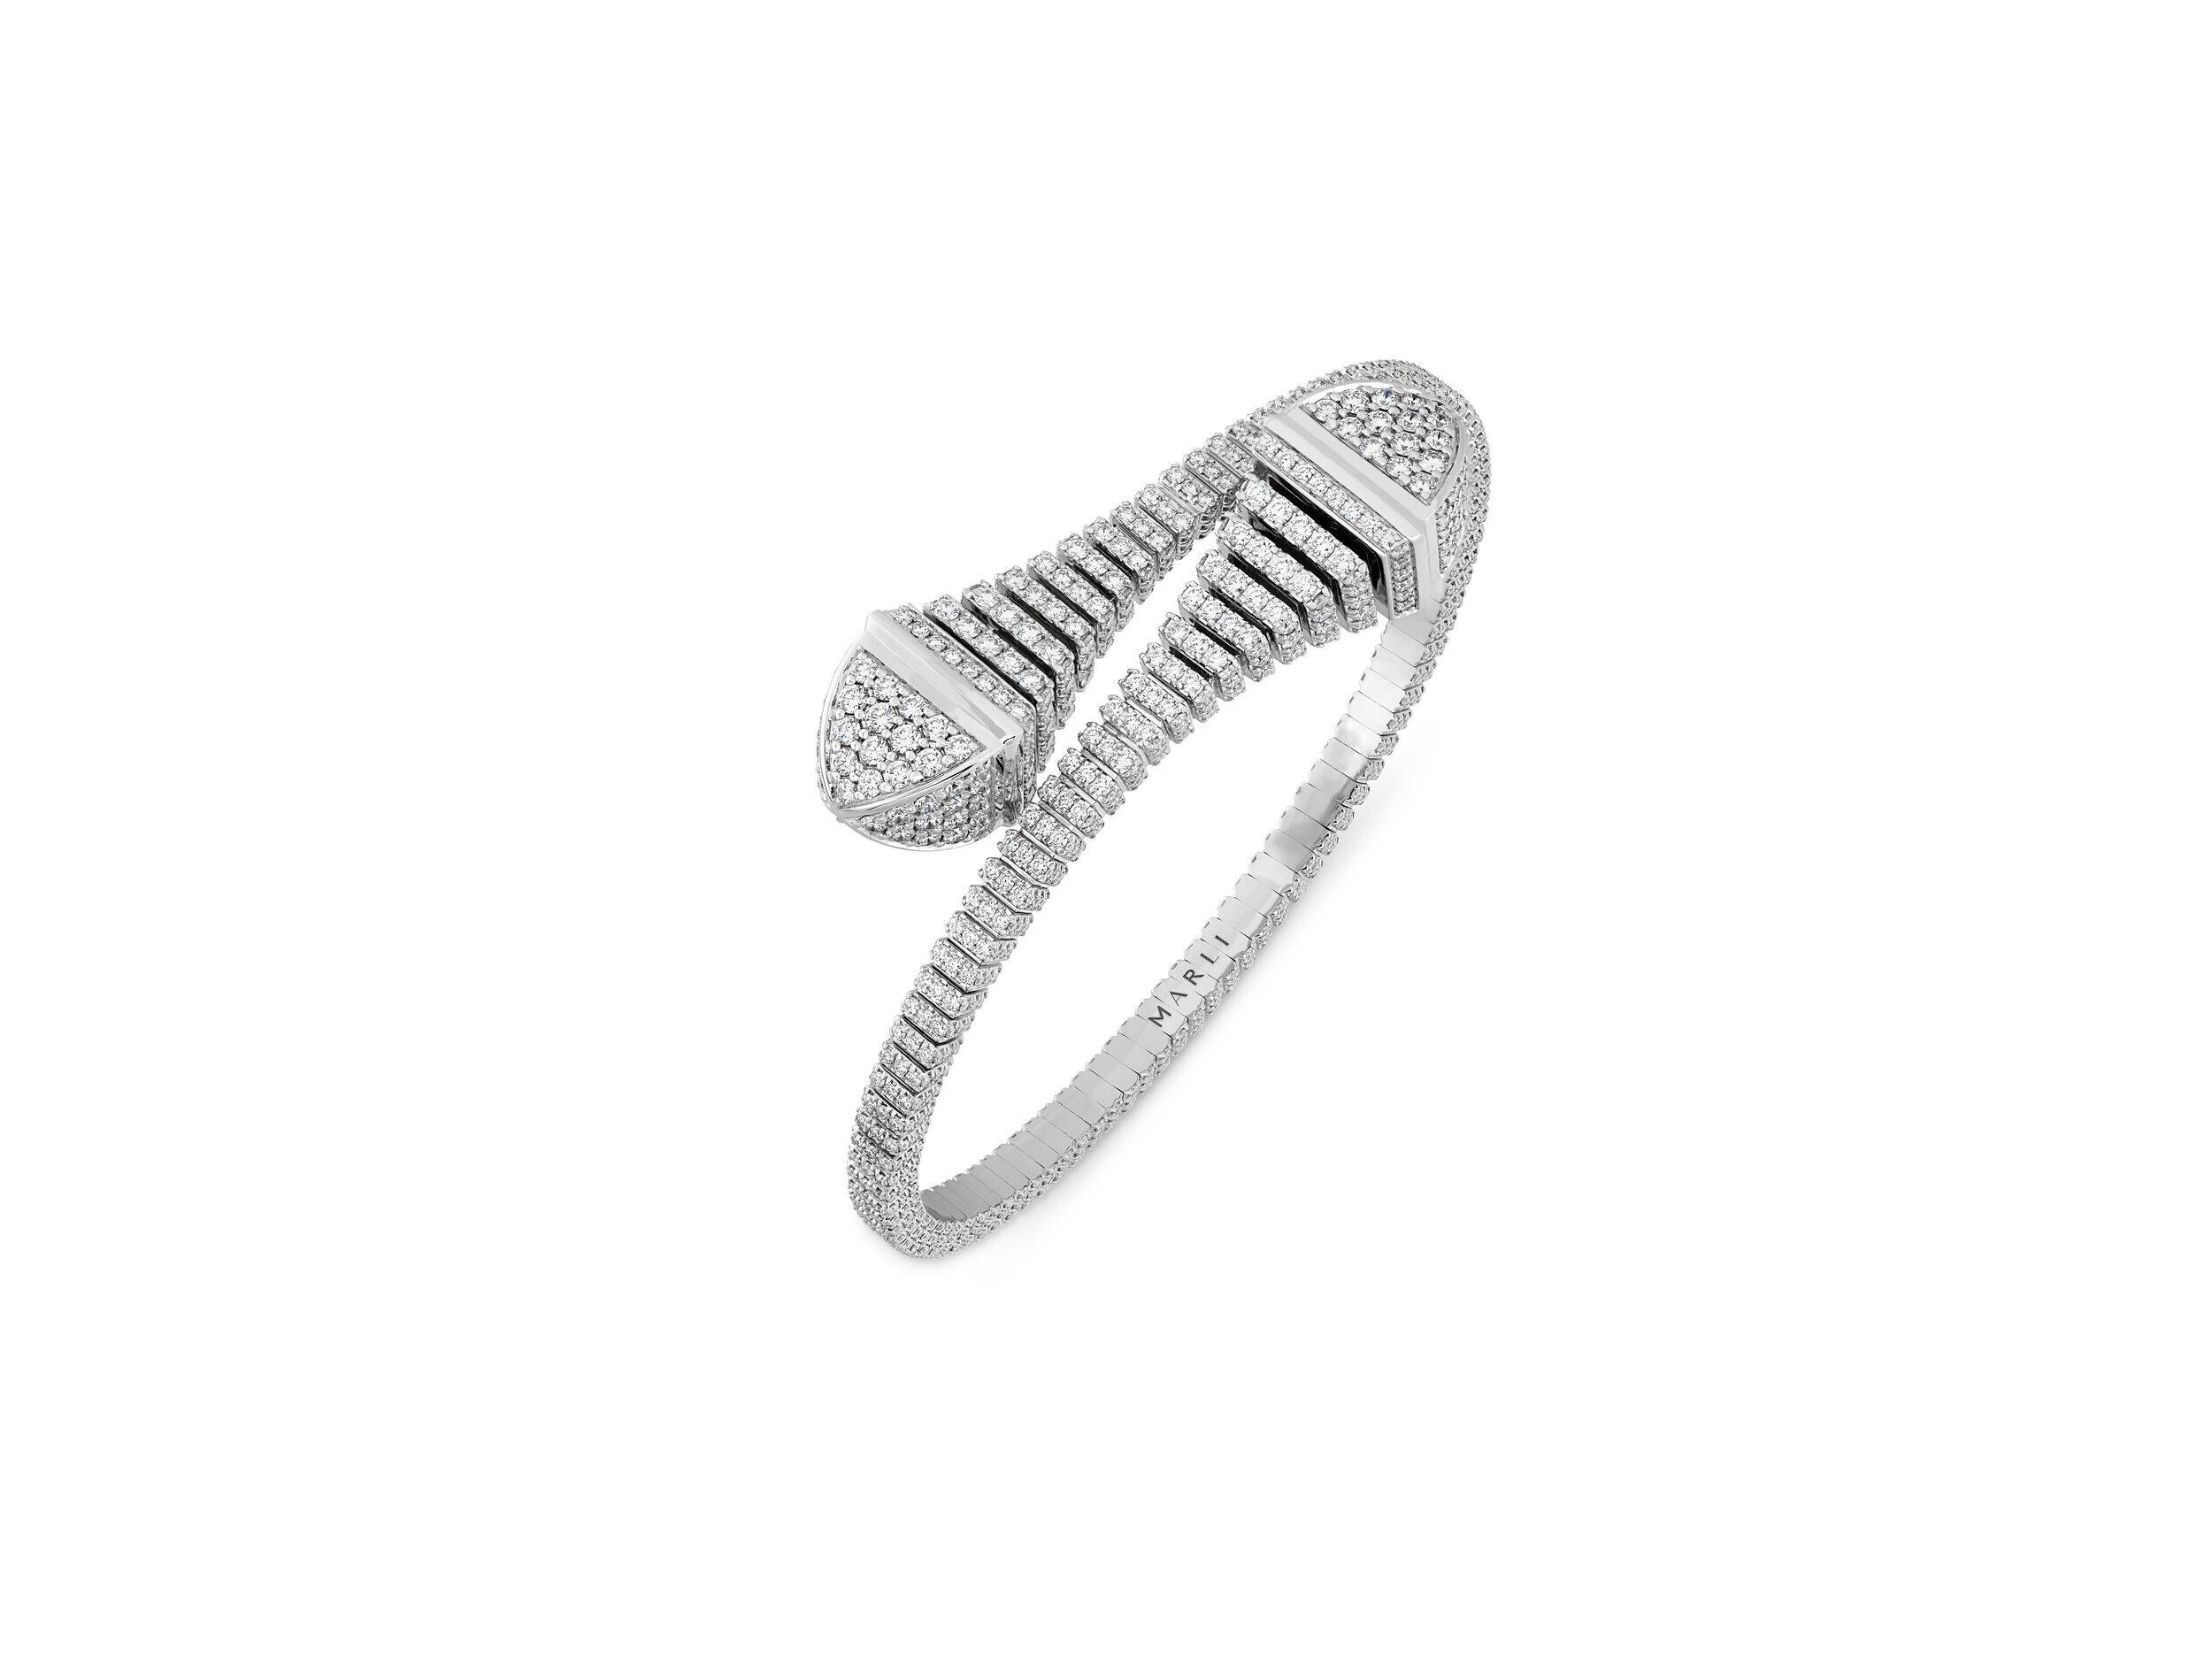 Marli New York Fine Jewelry For A New Generation Of Women